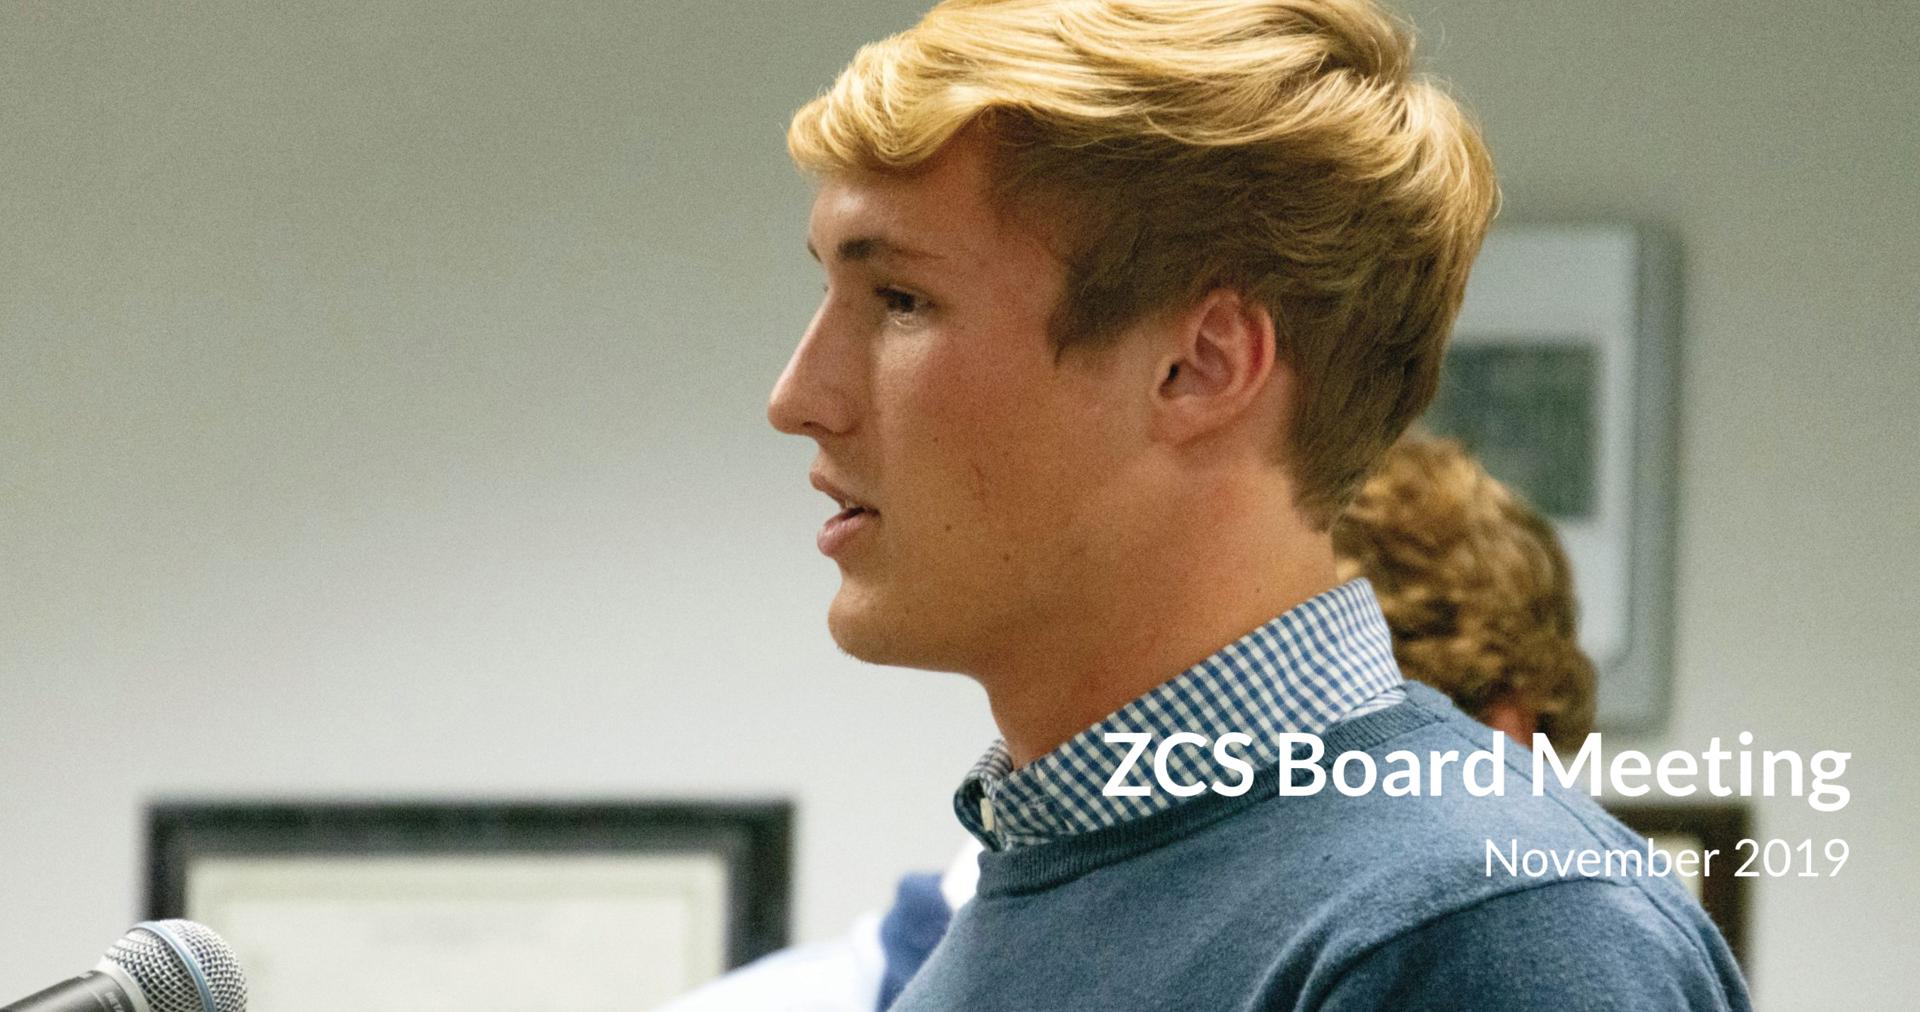 Board Update November 2019